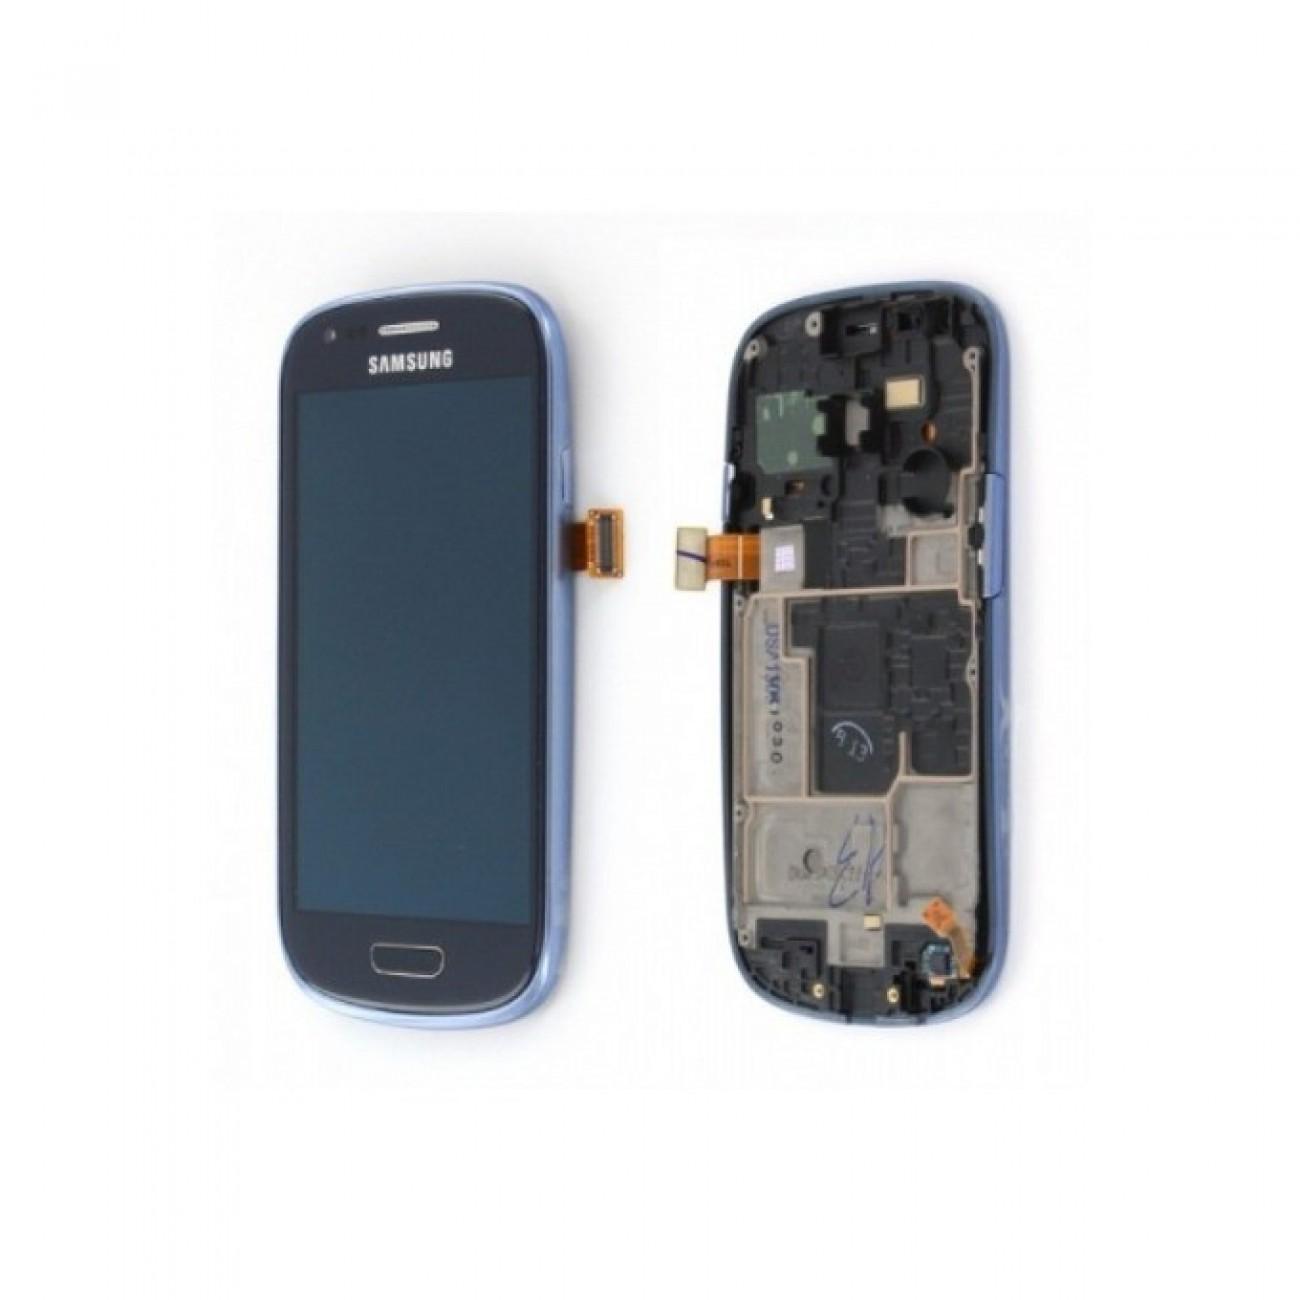 Дисплей за Samsung Galaxy i8190 S3 Mini, LCD with touch and frame, син в Резервни части -  | Alleop